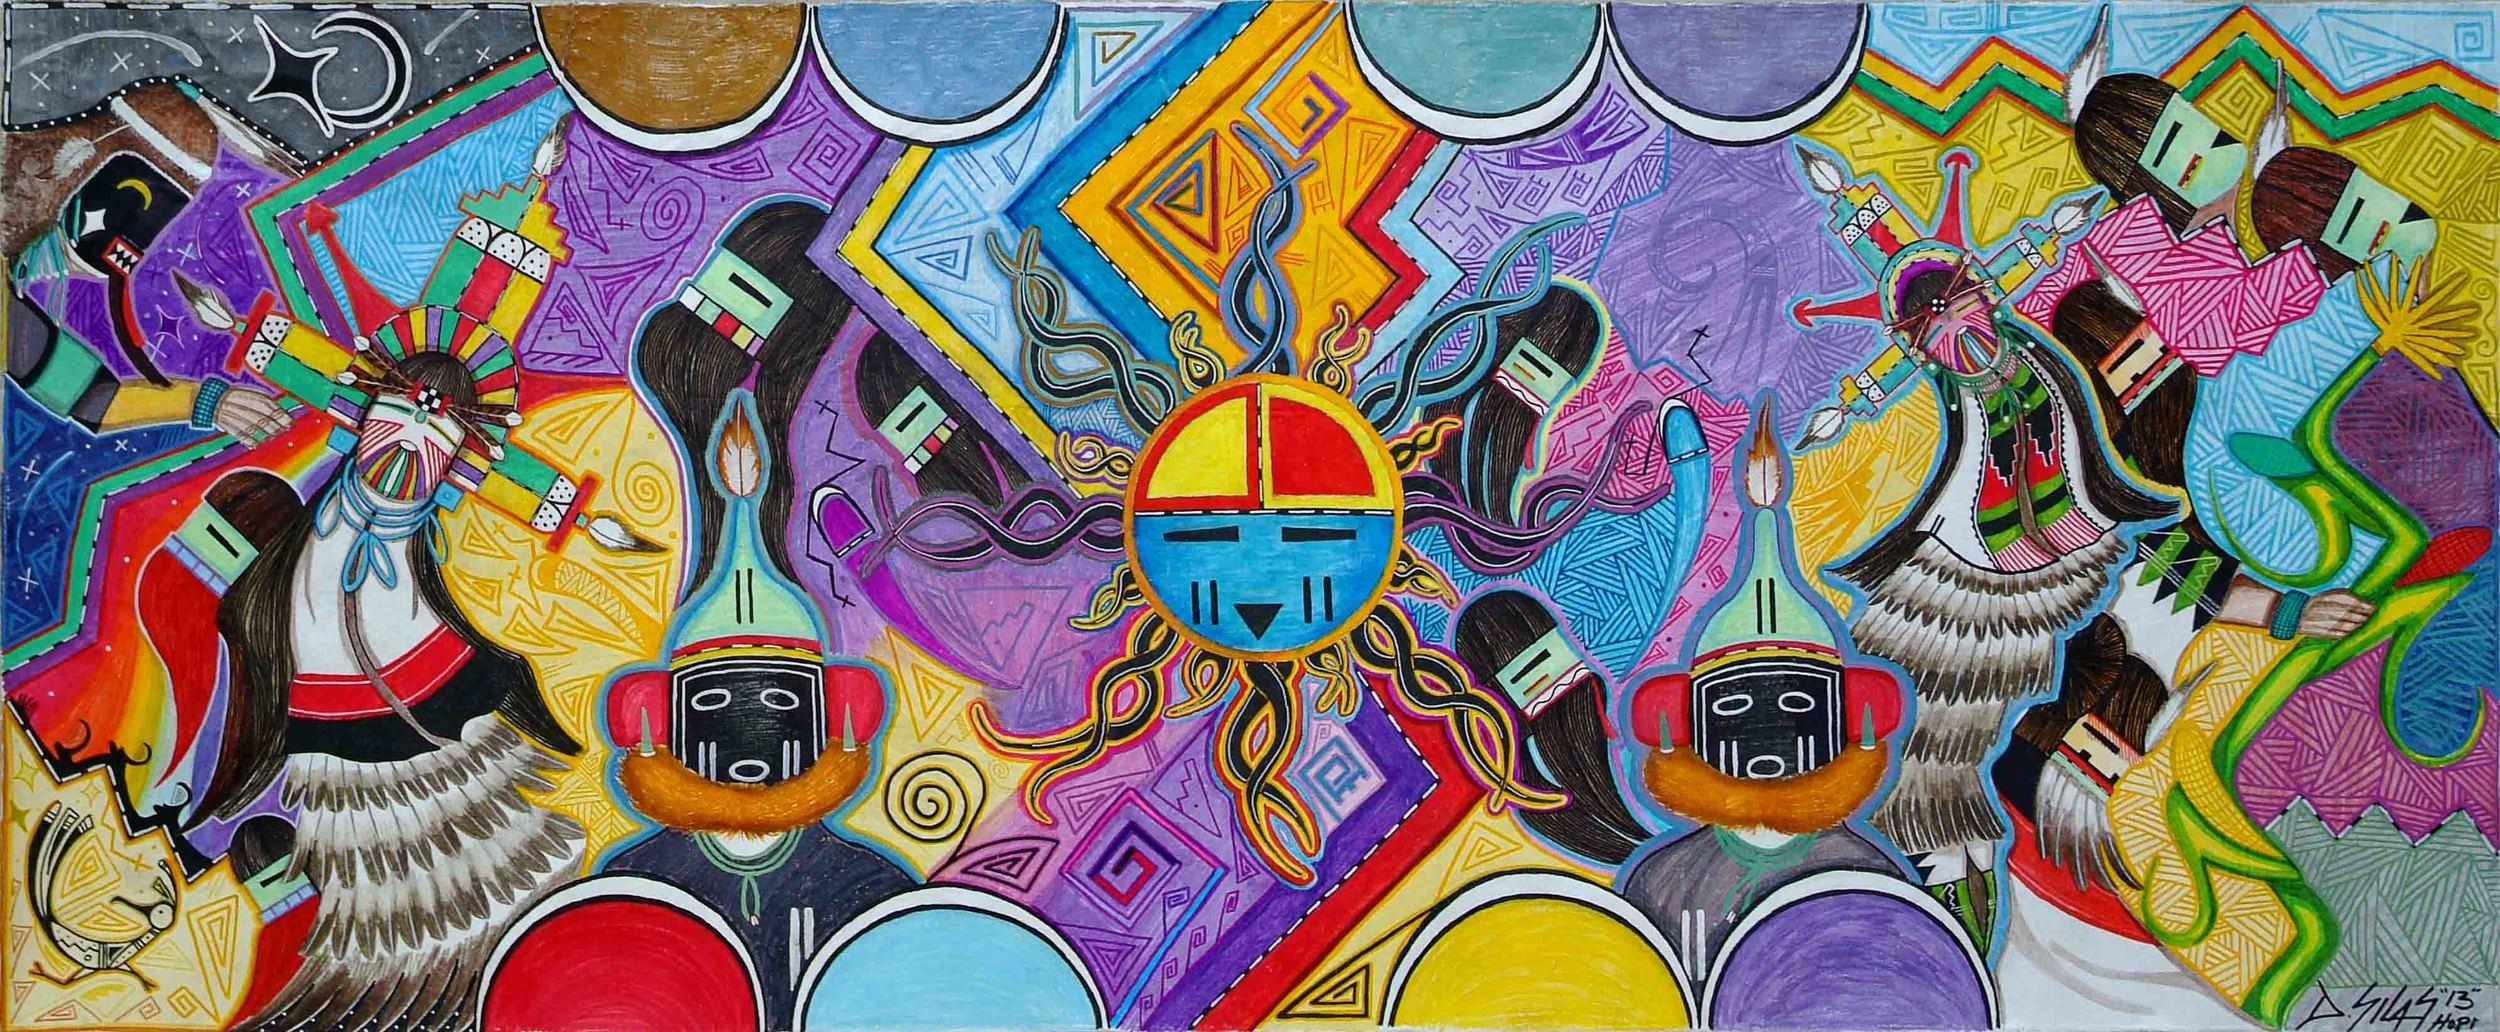 Summertime (DRawing No. 17), Hopi Native American collaboration